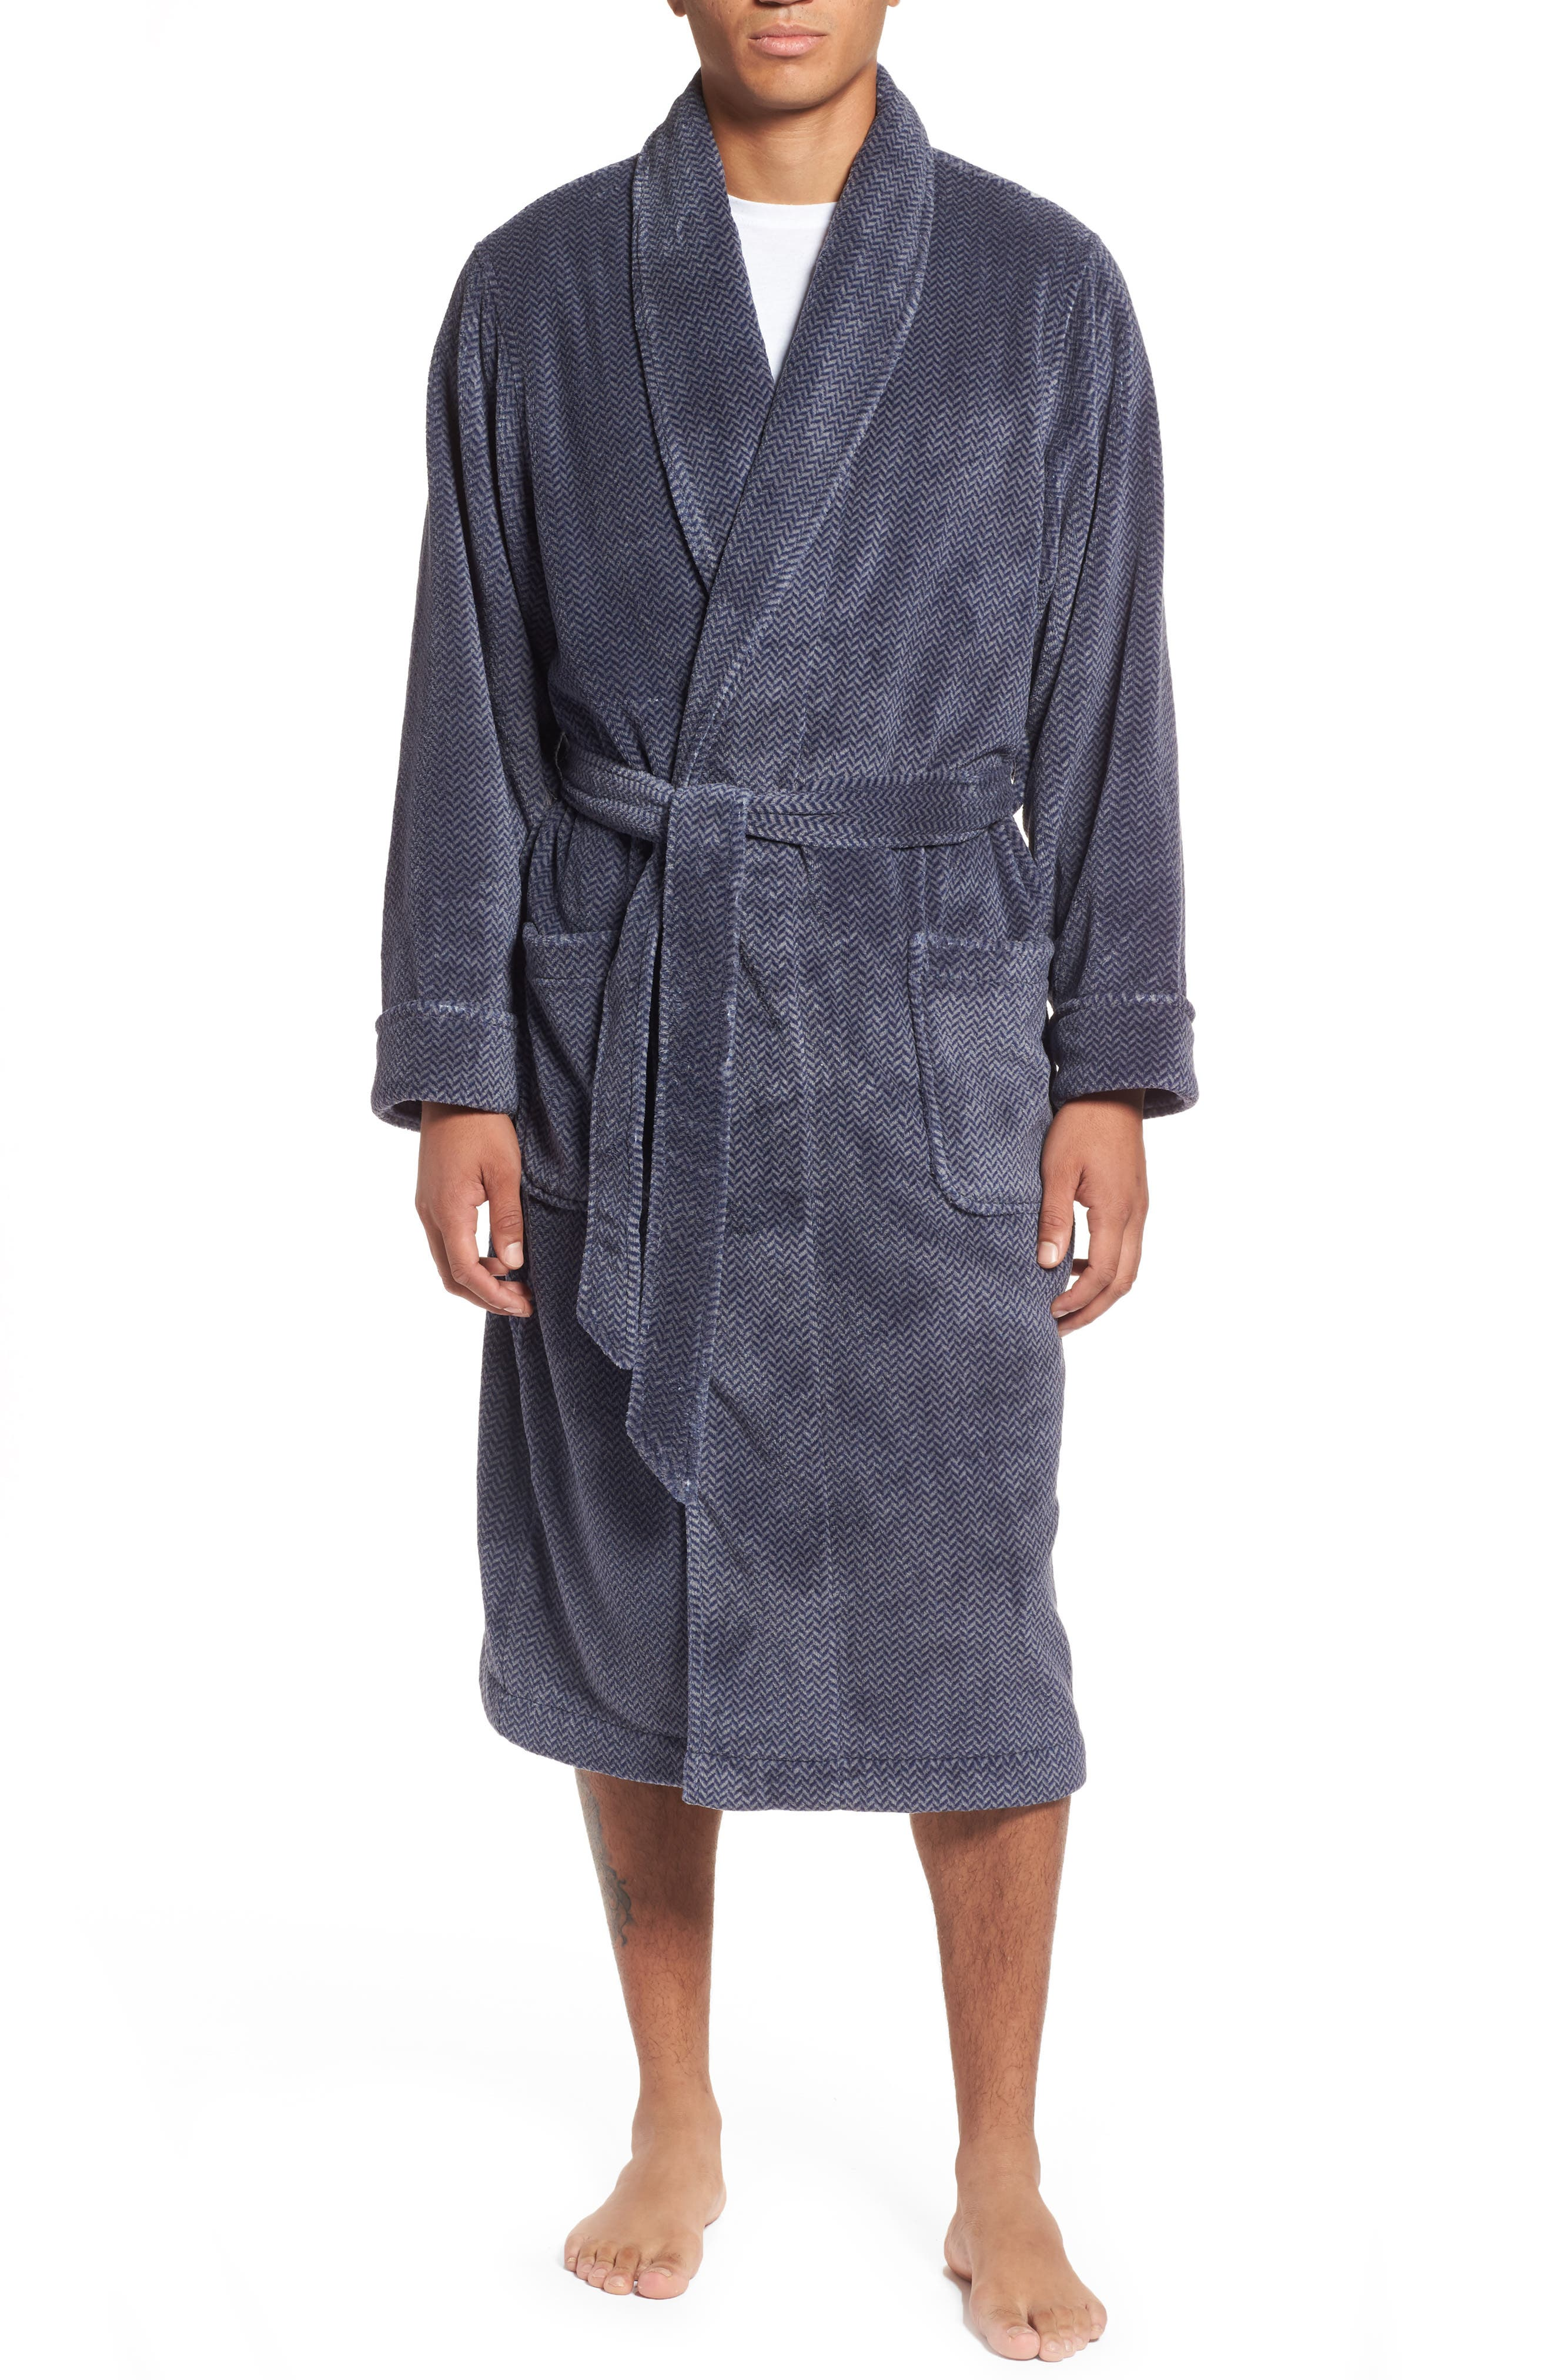 Herringbone Fleece Robe,                         Main,                         color, NAVY INDIGO- GREY HERRINGBONE